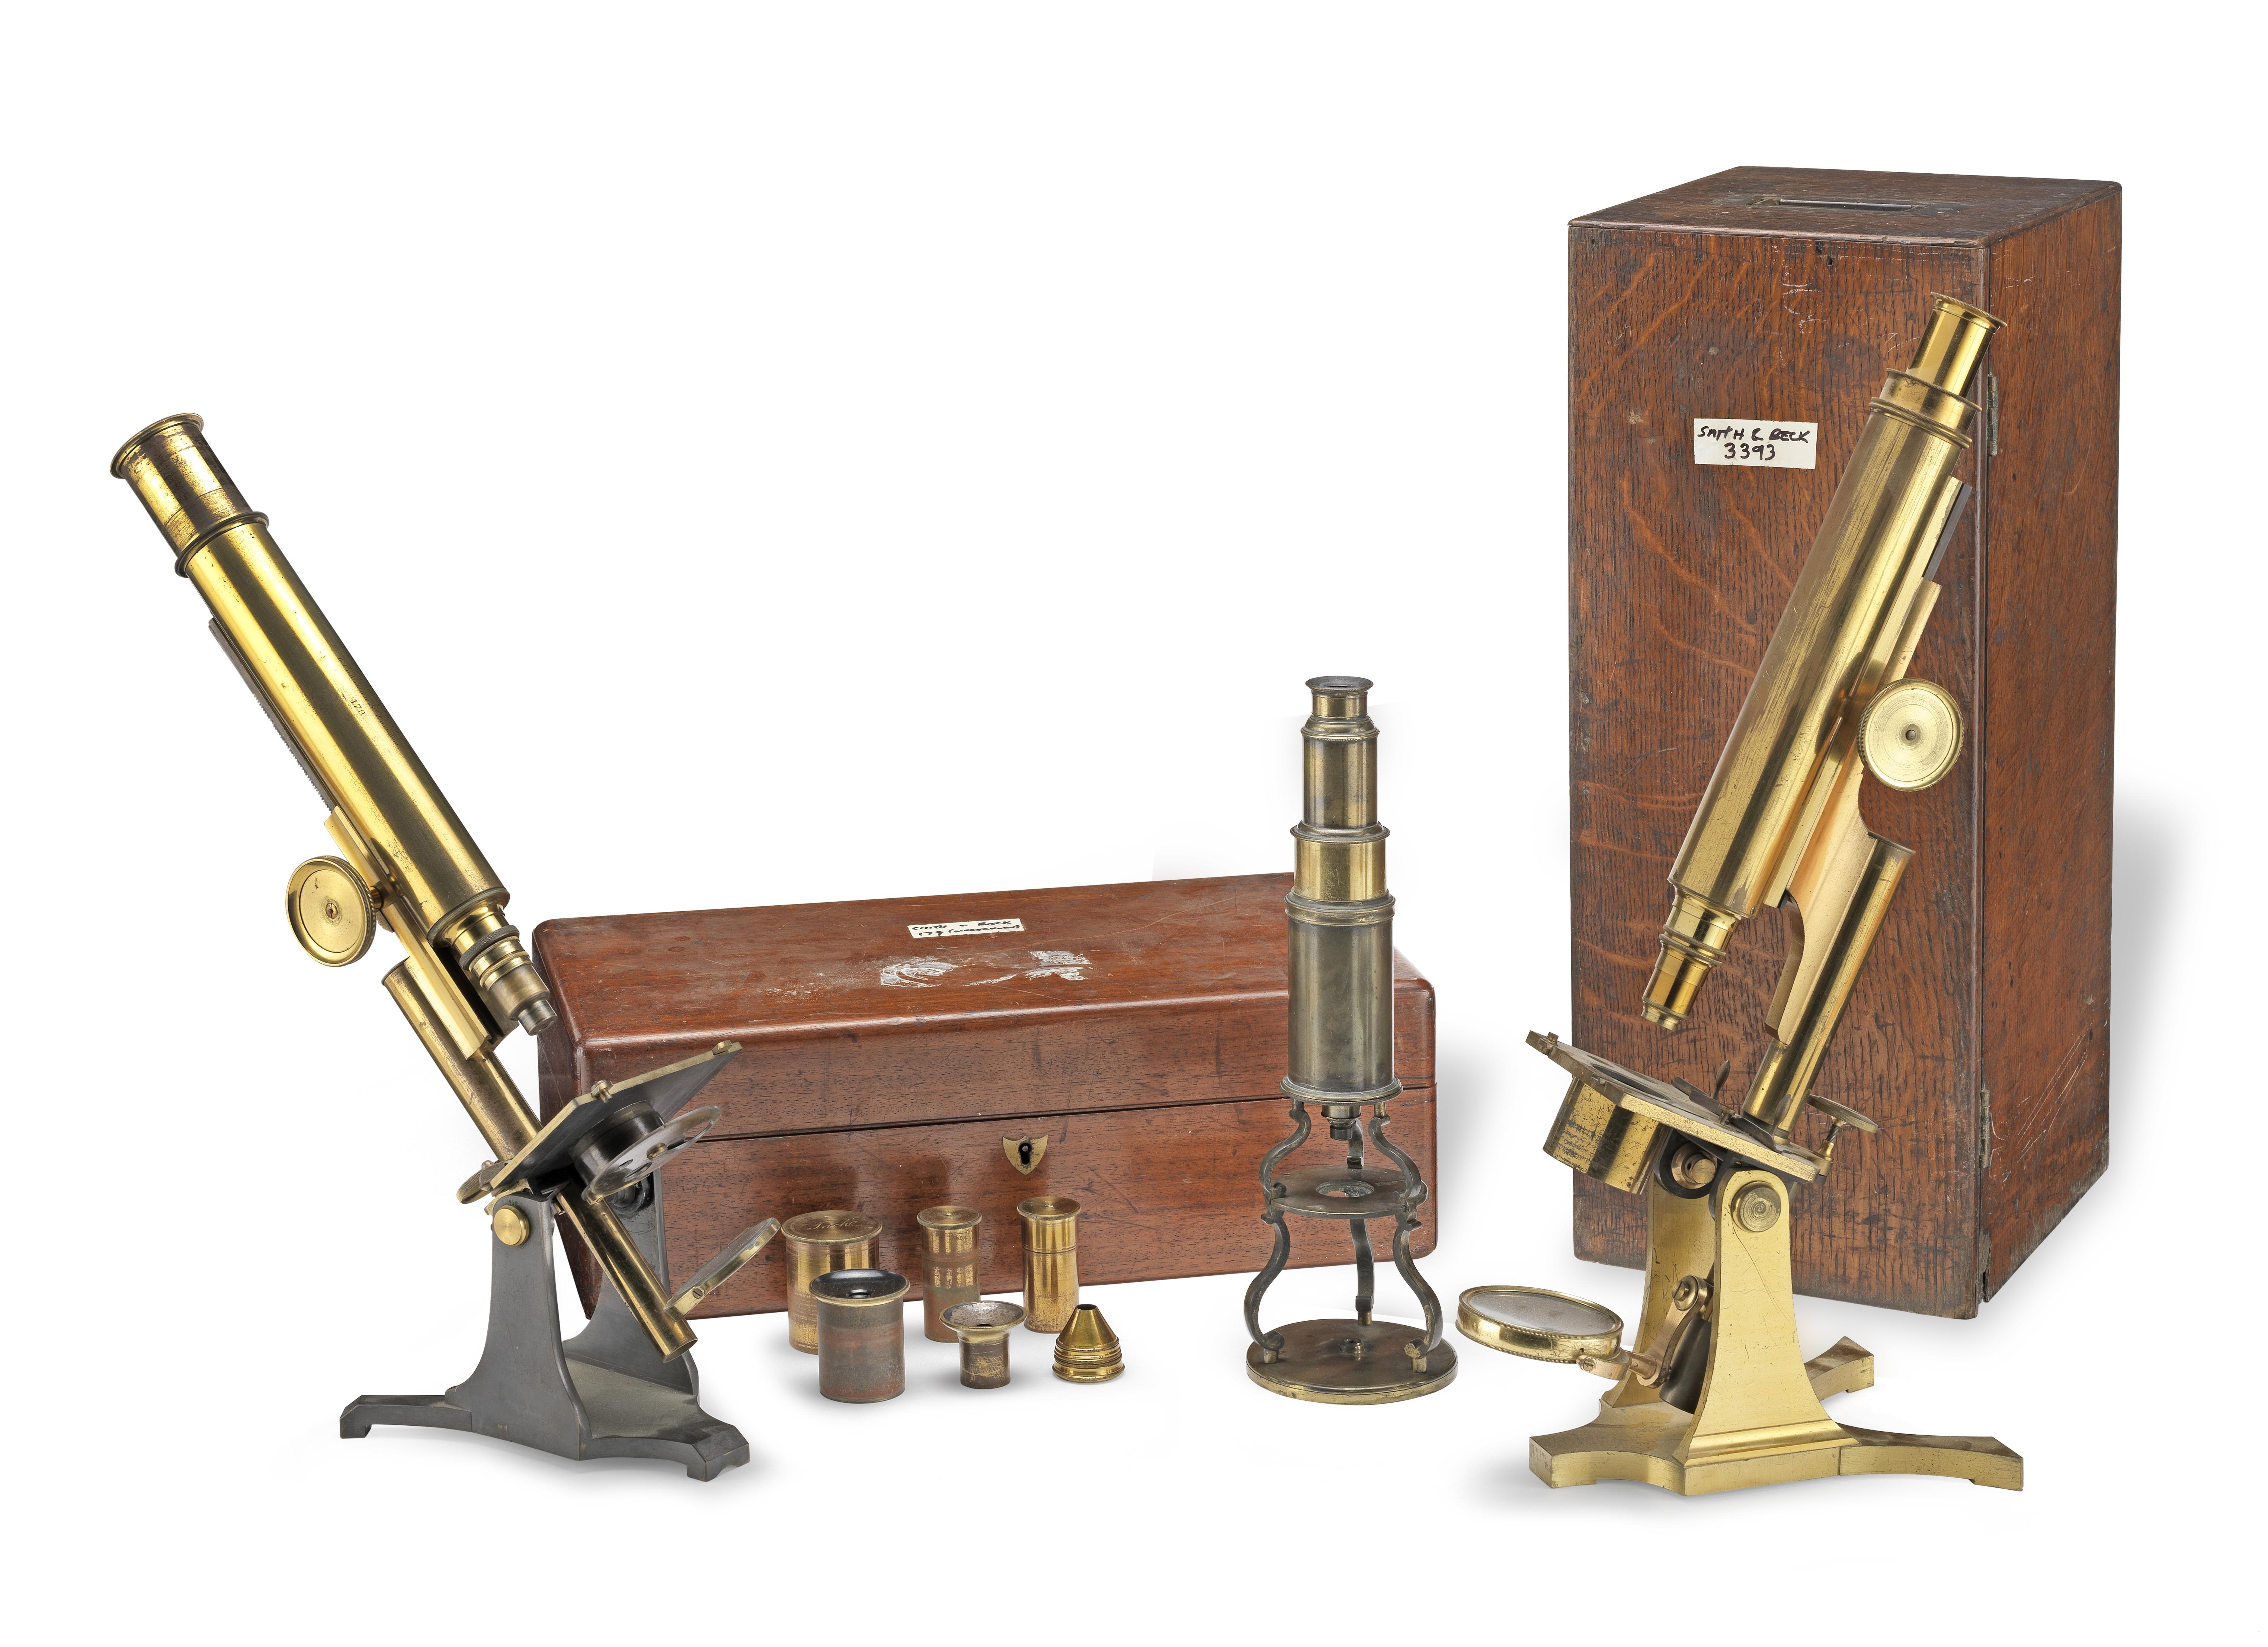 Three Compound Monocular Microscopes, English, 19th century, (3)